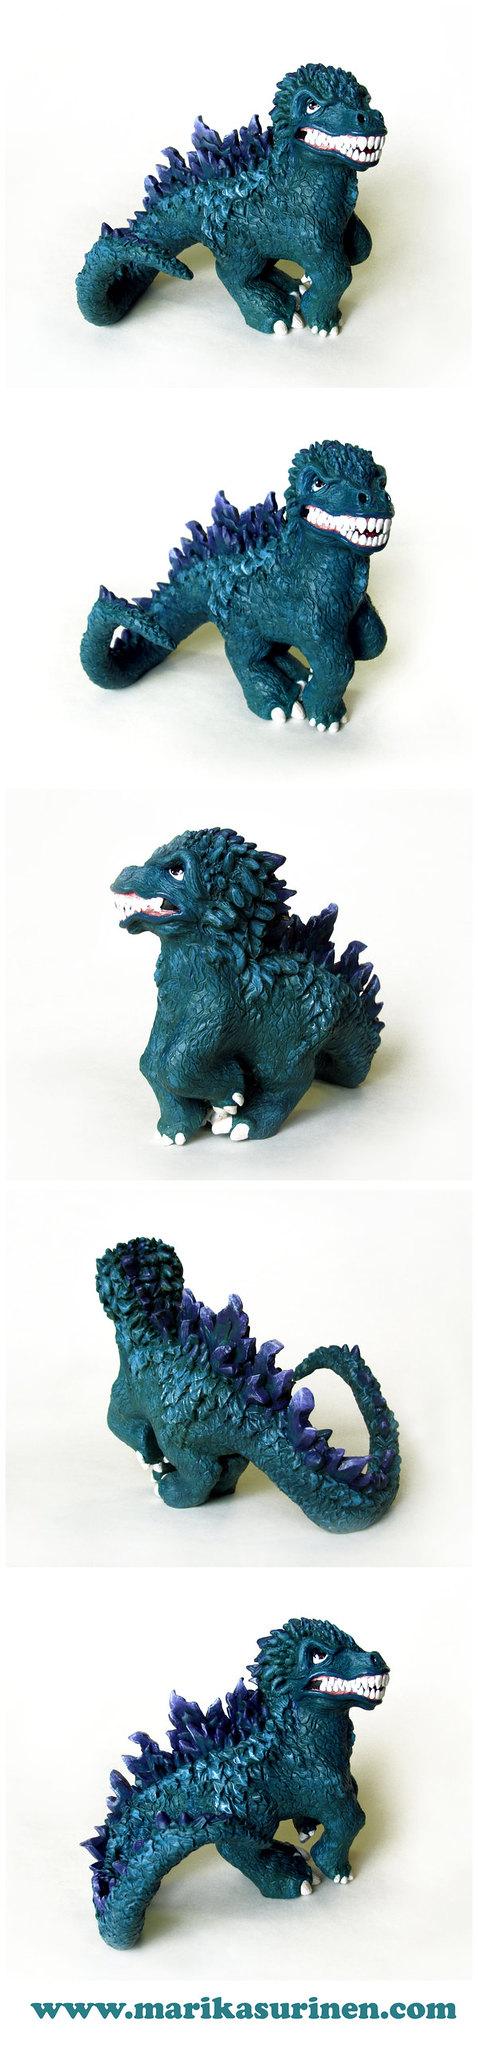 My Little Godzilla by Spippo